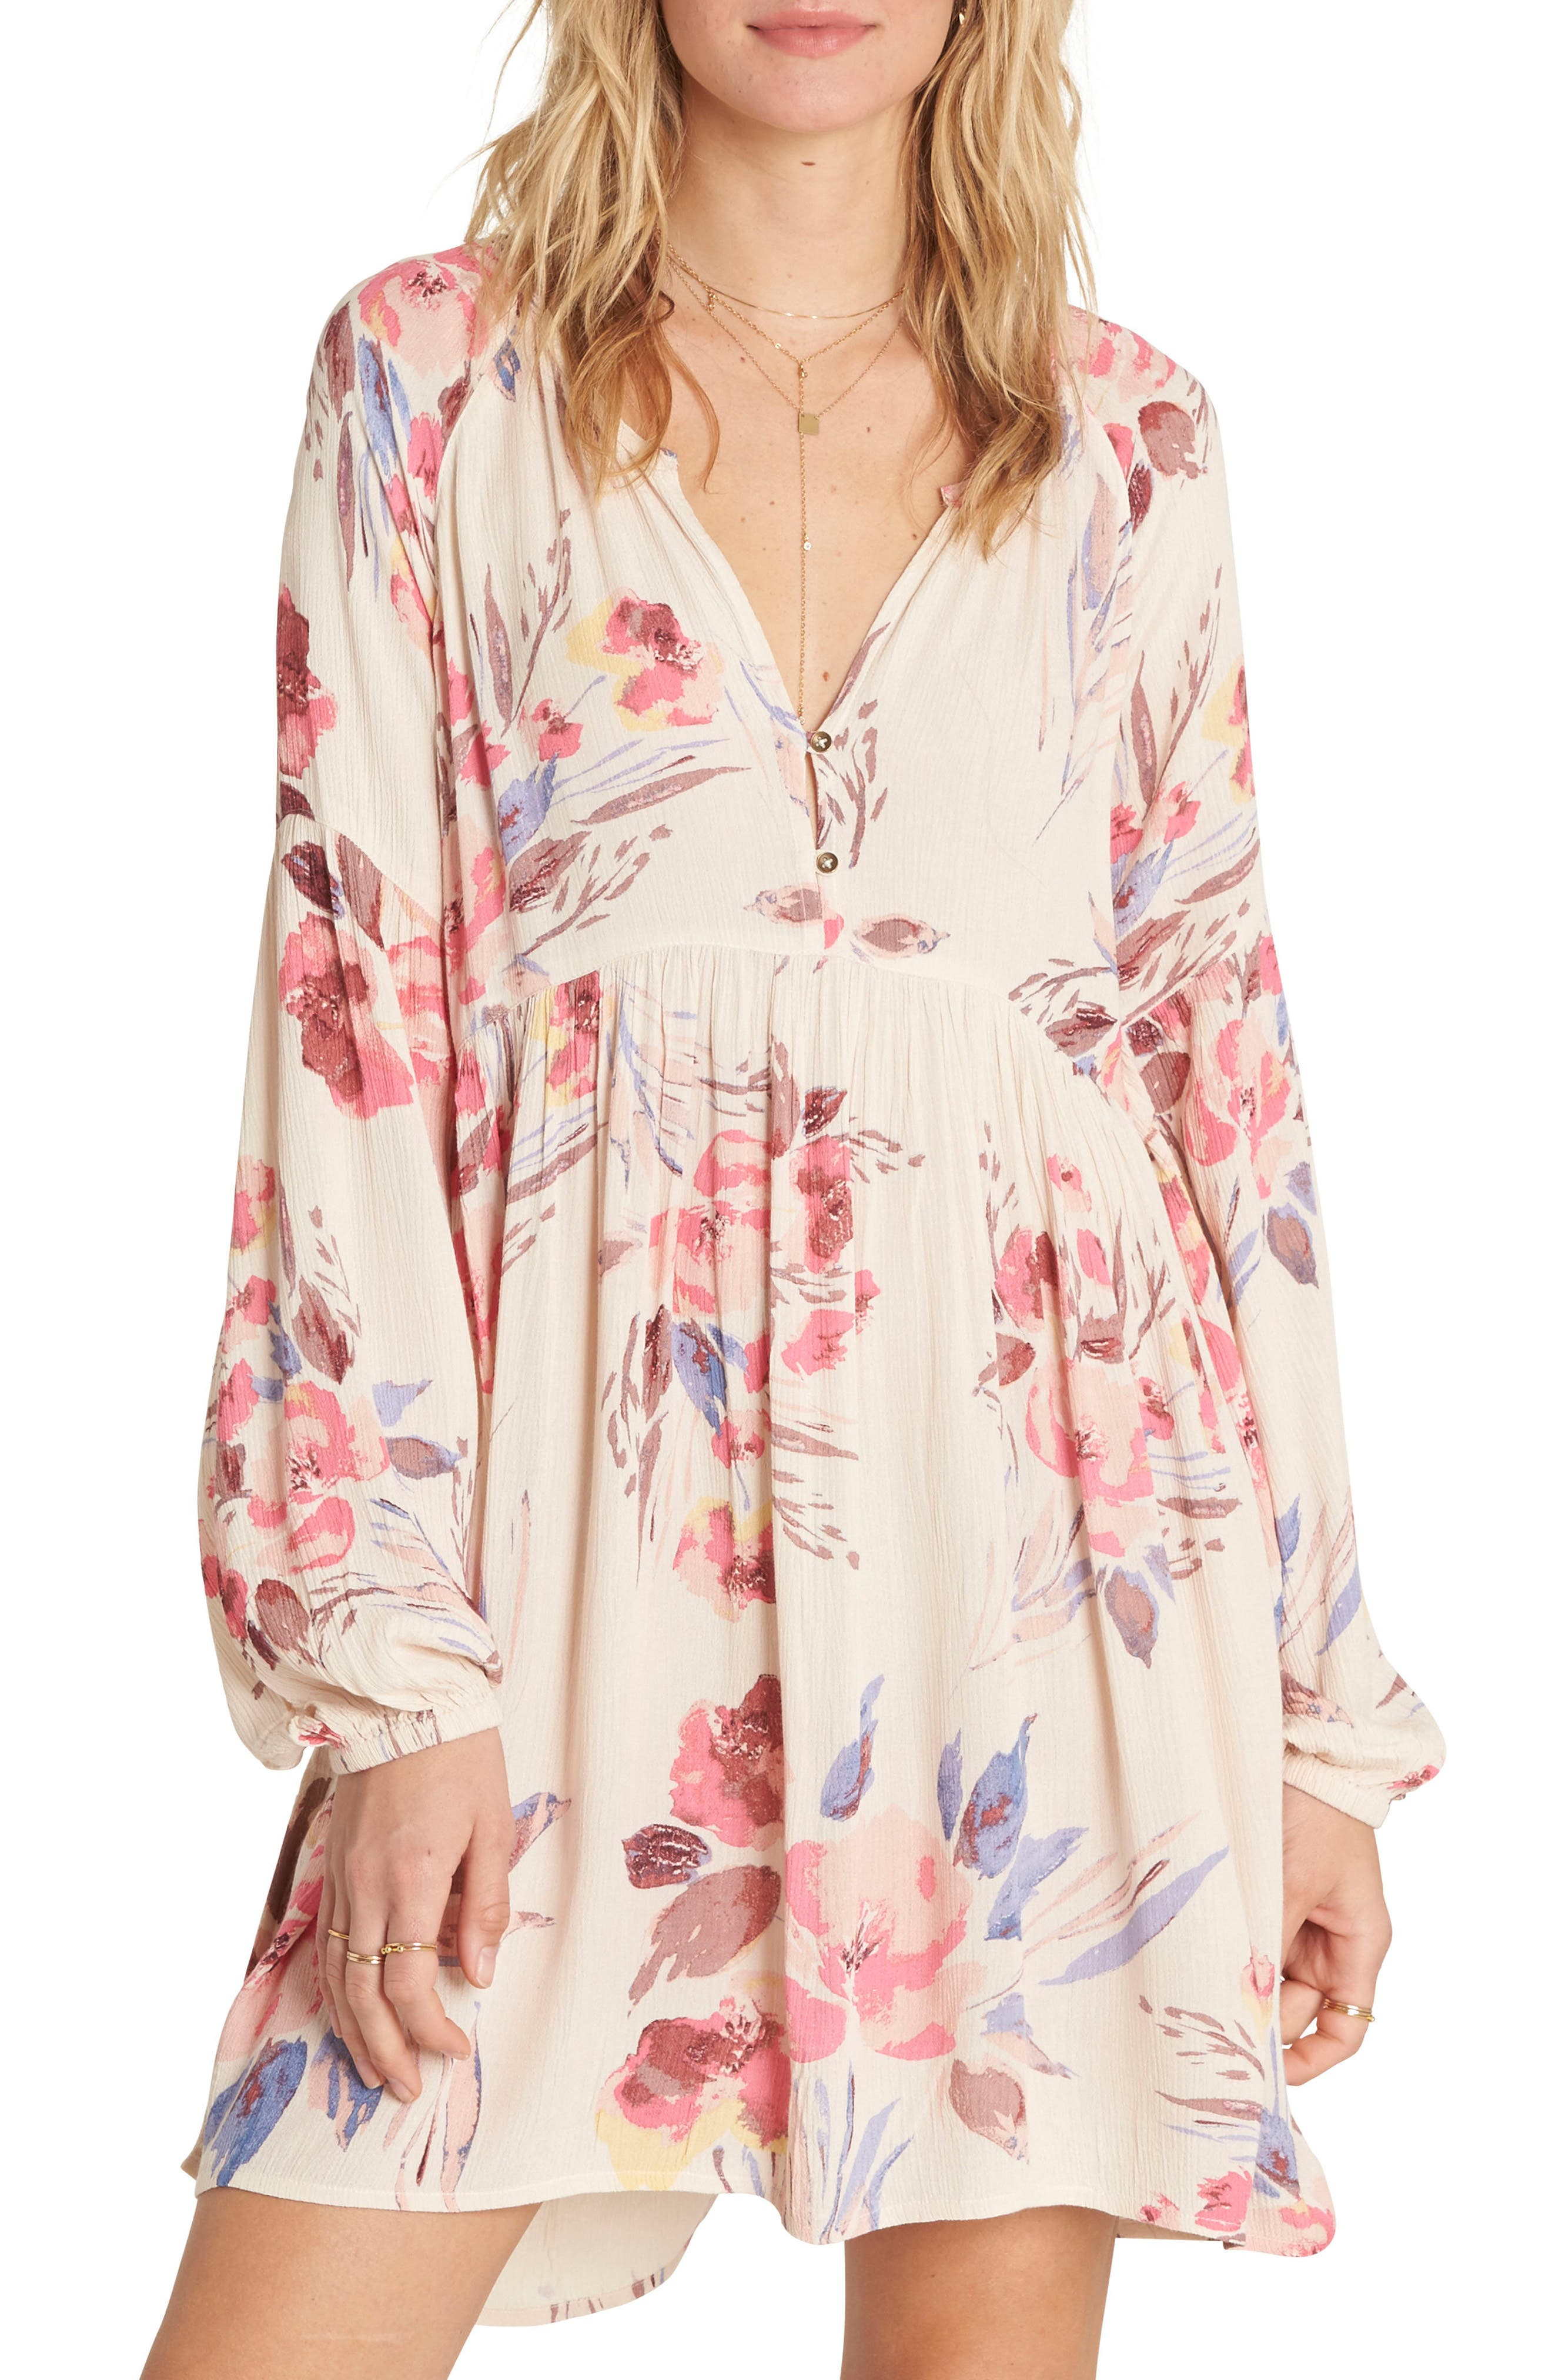 Until Tomorrow Babydoll Dress,                         Main,                         color, 900